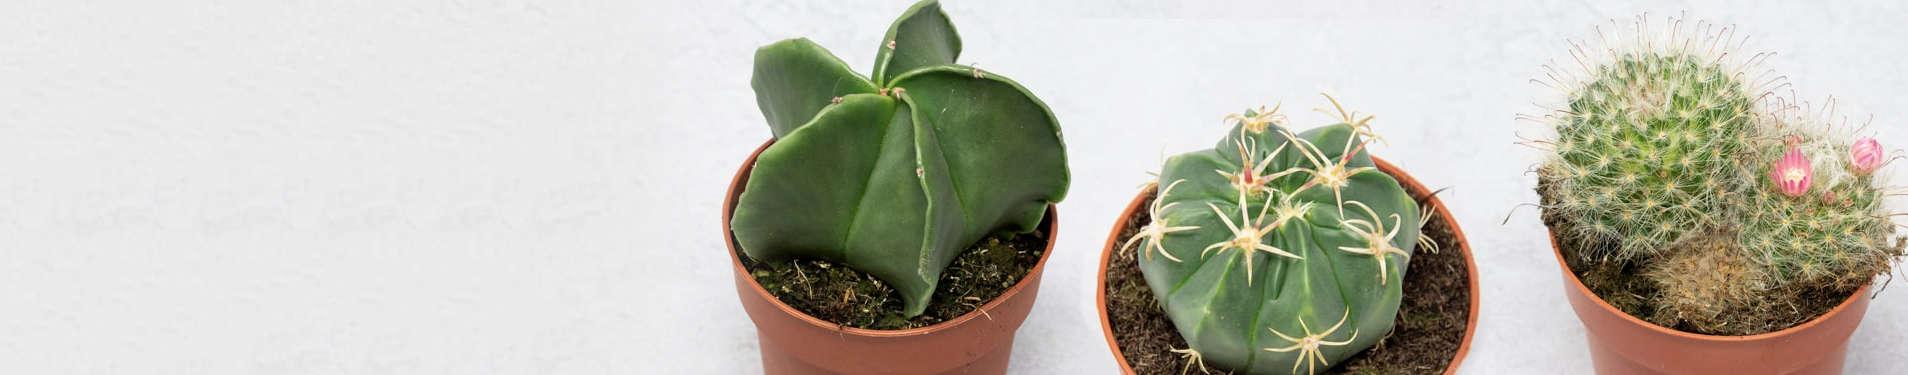 Comprar online cactus redondos